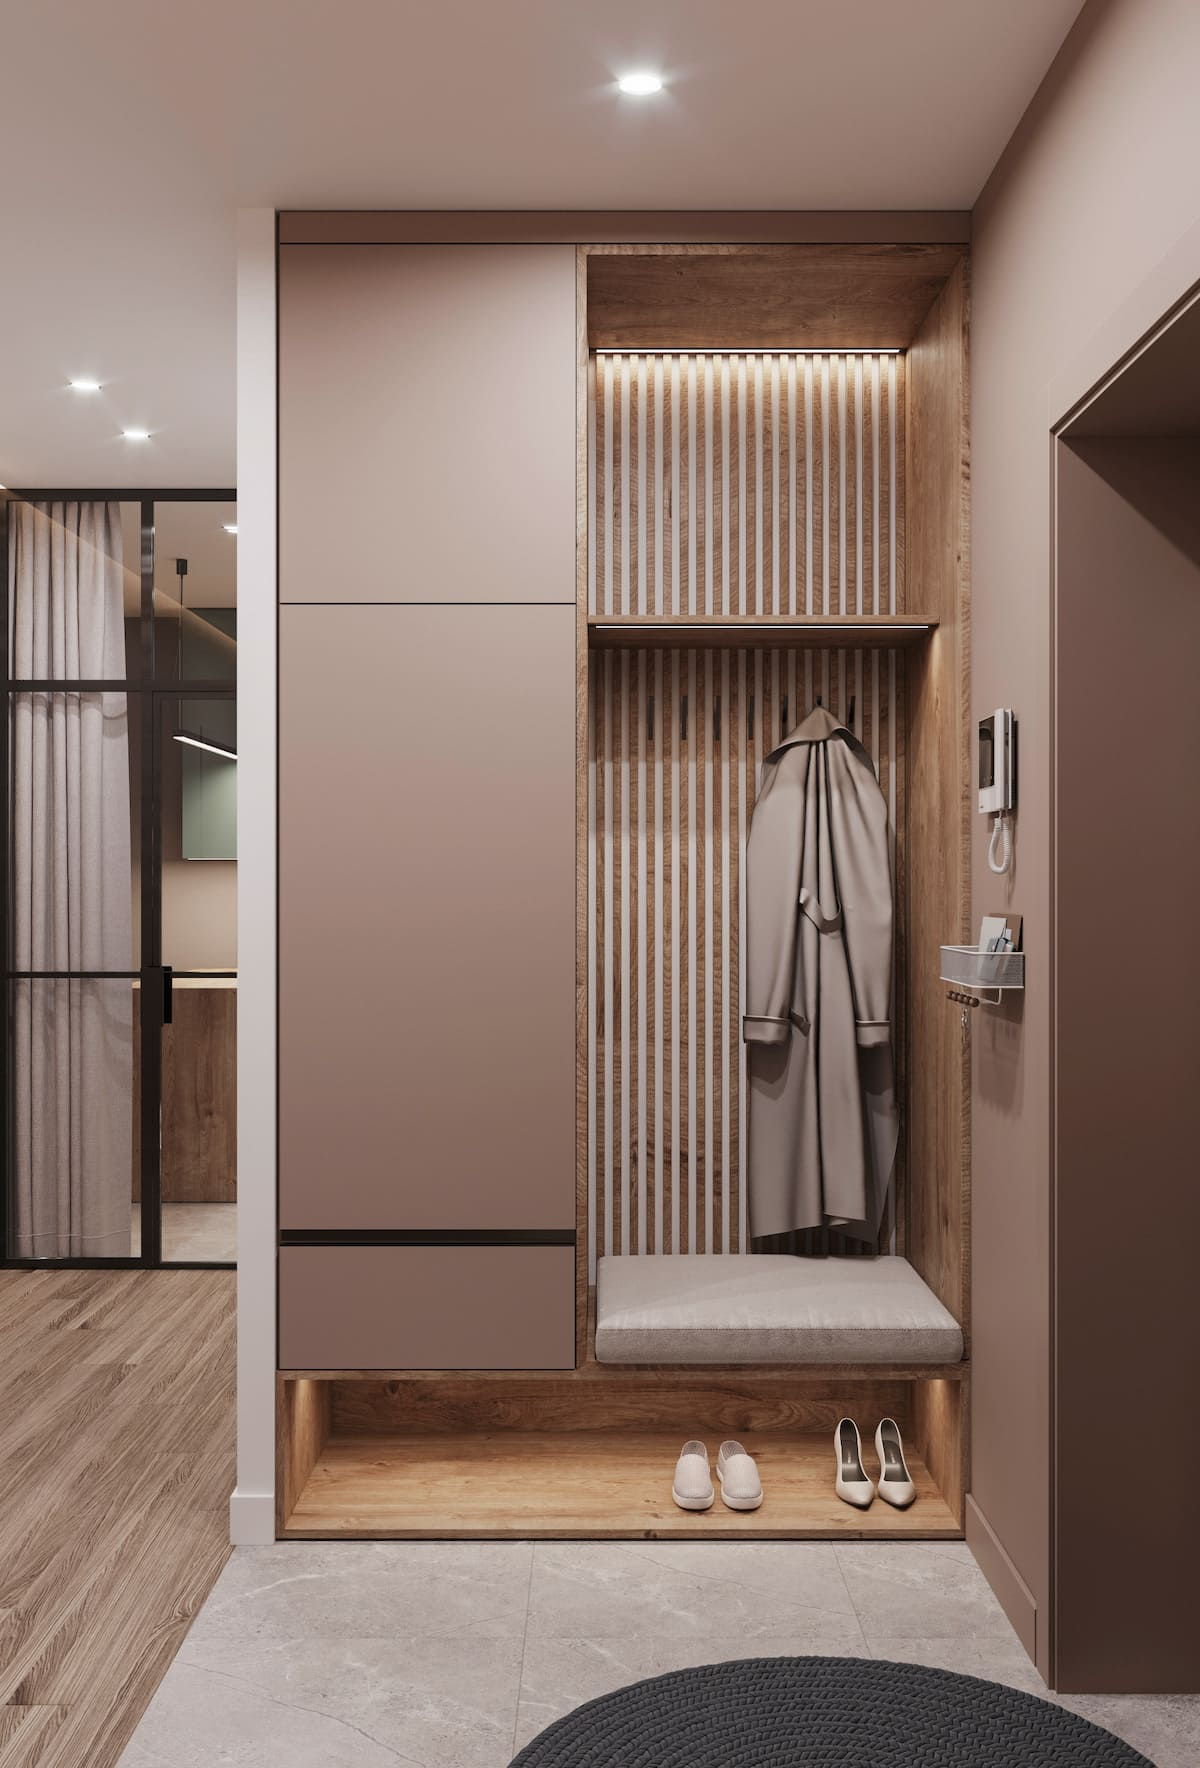 модный дизайн интерьера квартиры фото 98